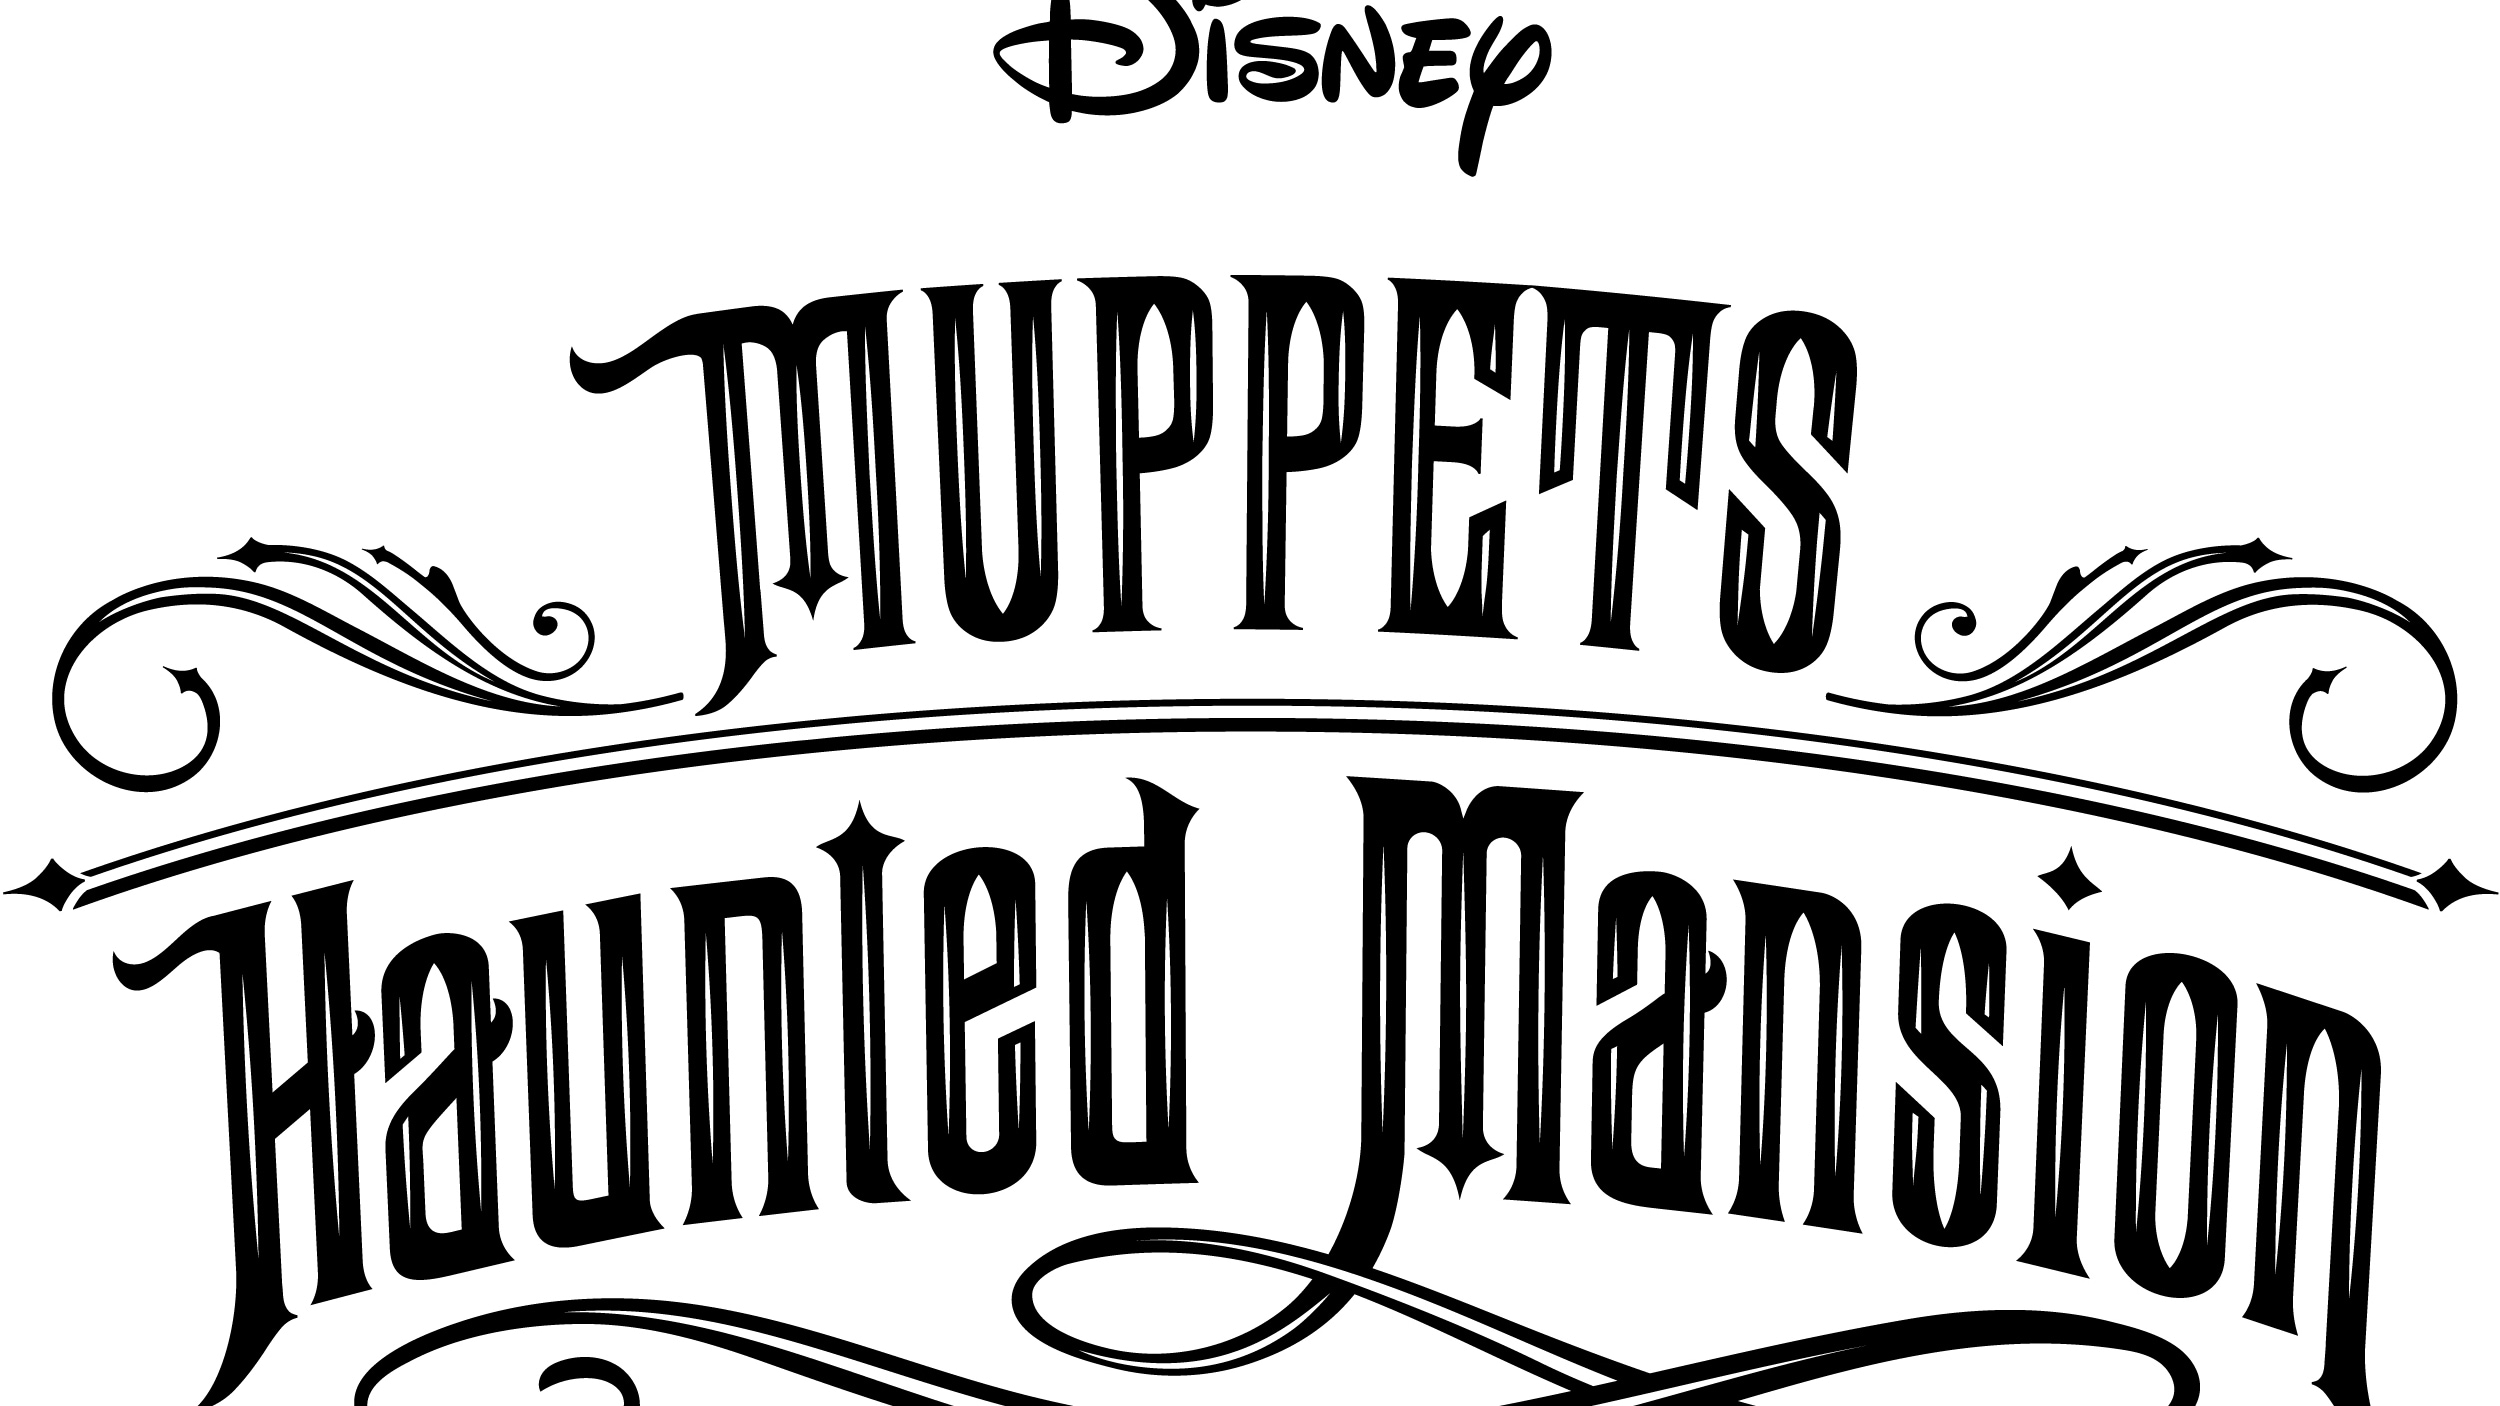 Muppets Haunted Mansion Logo - White